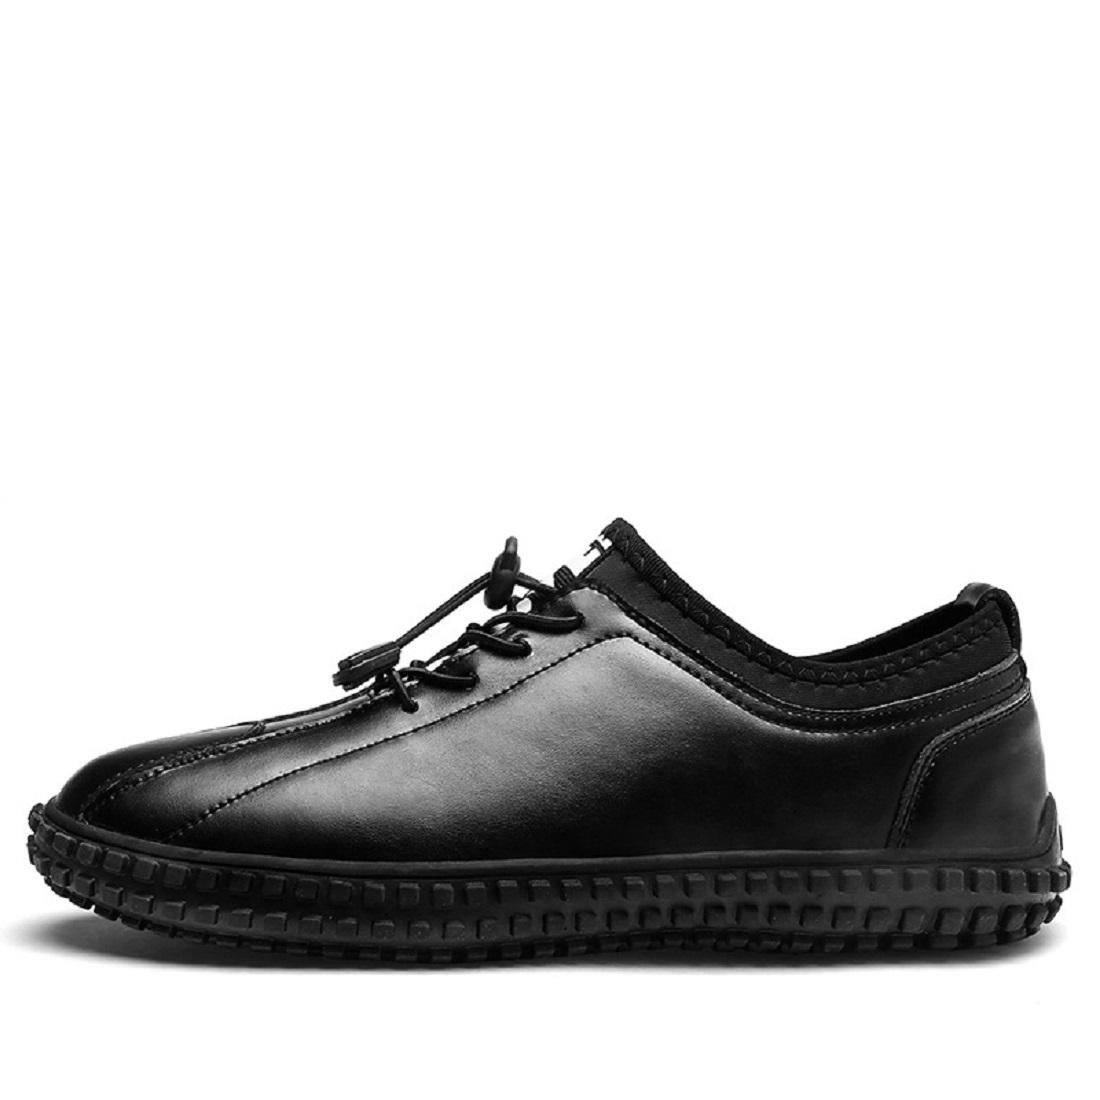 Herren Mode Freizeit Lederschuhe Rutschfest Flache Schuhe Trainer Werkzeugschuhe Lässige Schuhe EUR GRÖSSE 39-44